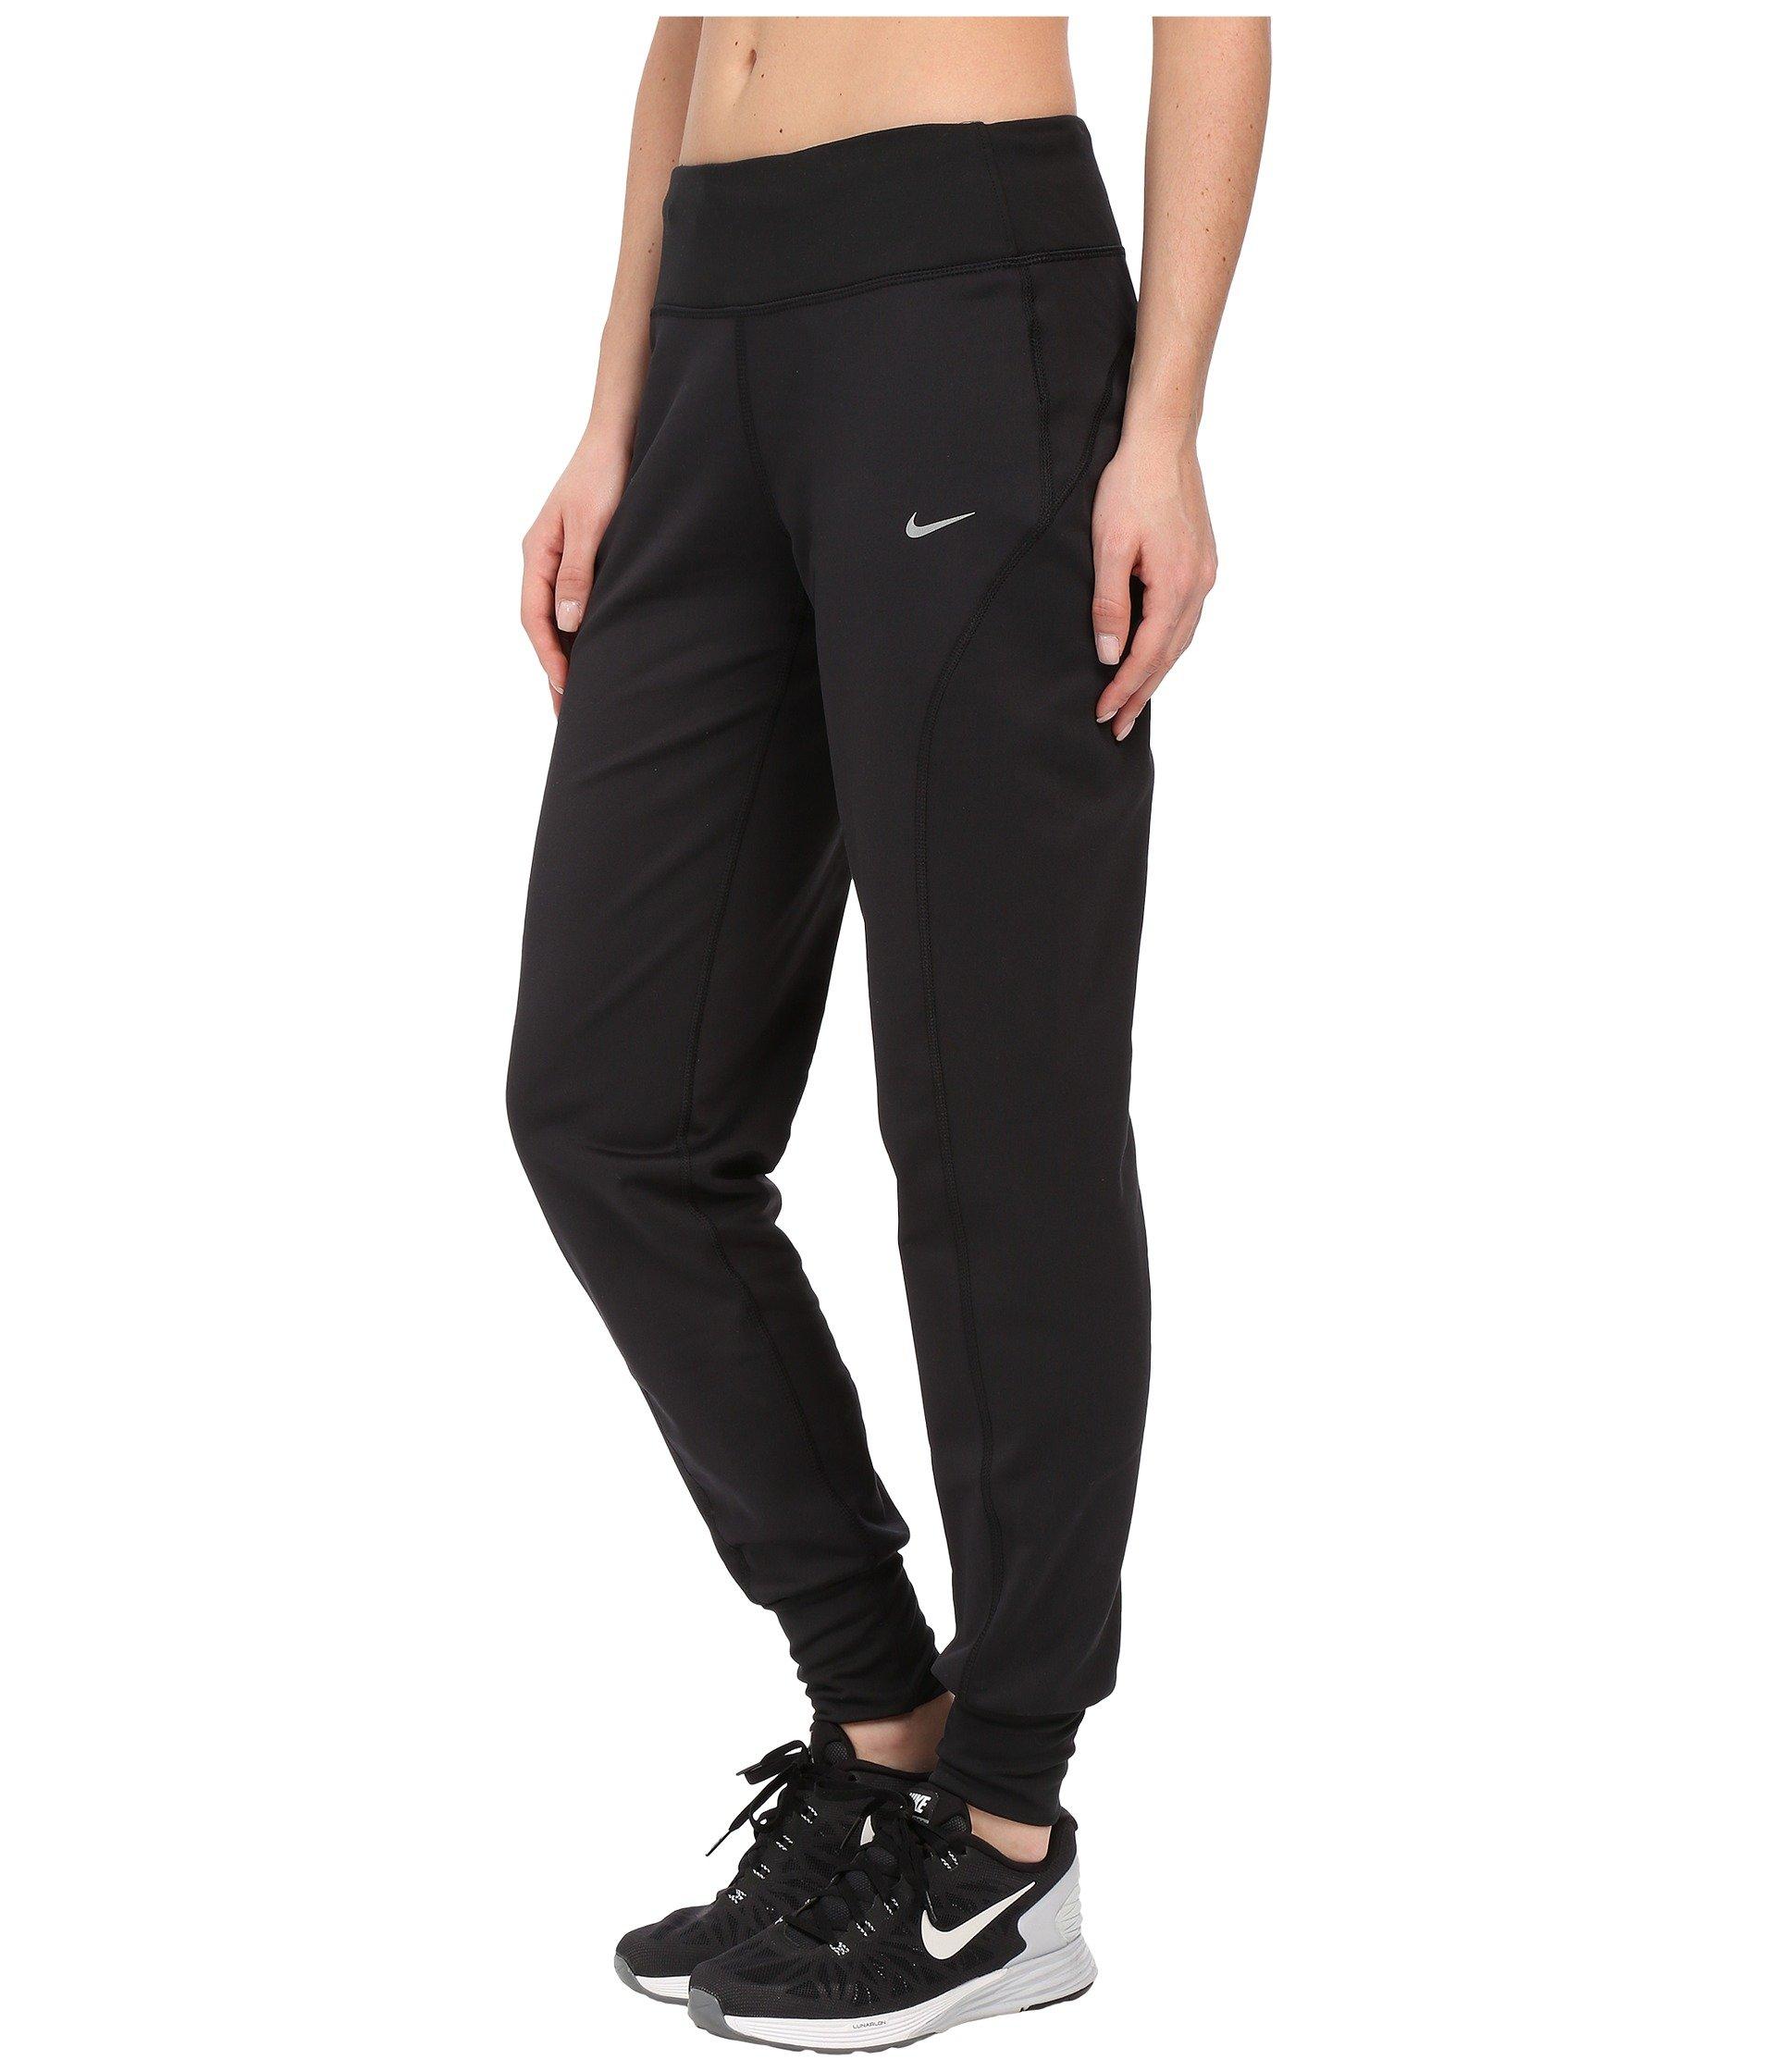 Brilliant Amazon.com  Nike Womenu0026#39;s Thermal Running Tights/Pants 547605-010 Black-Grey Small [S ...